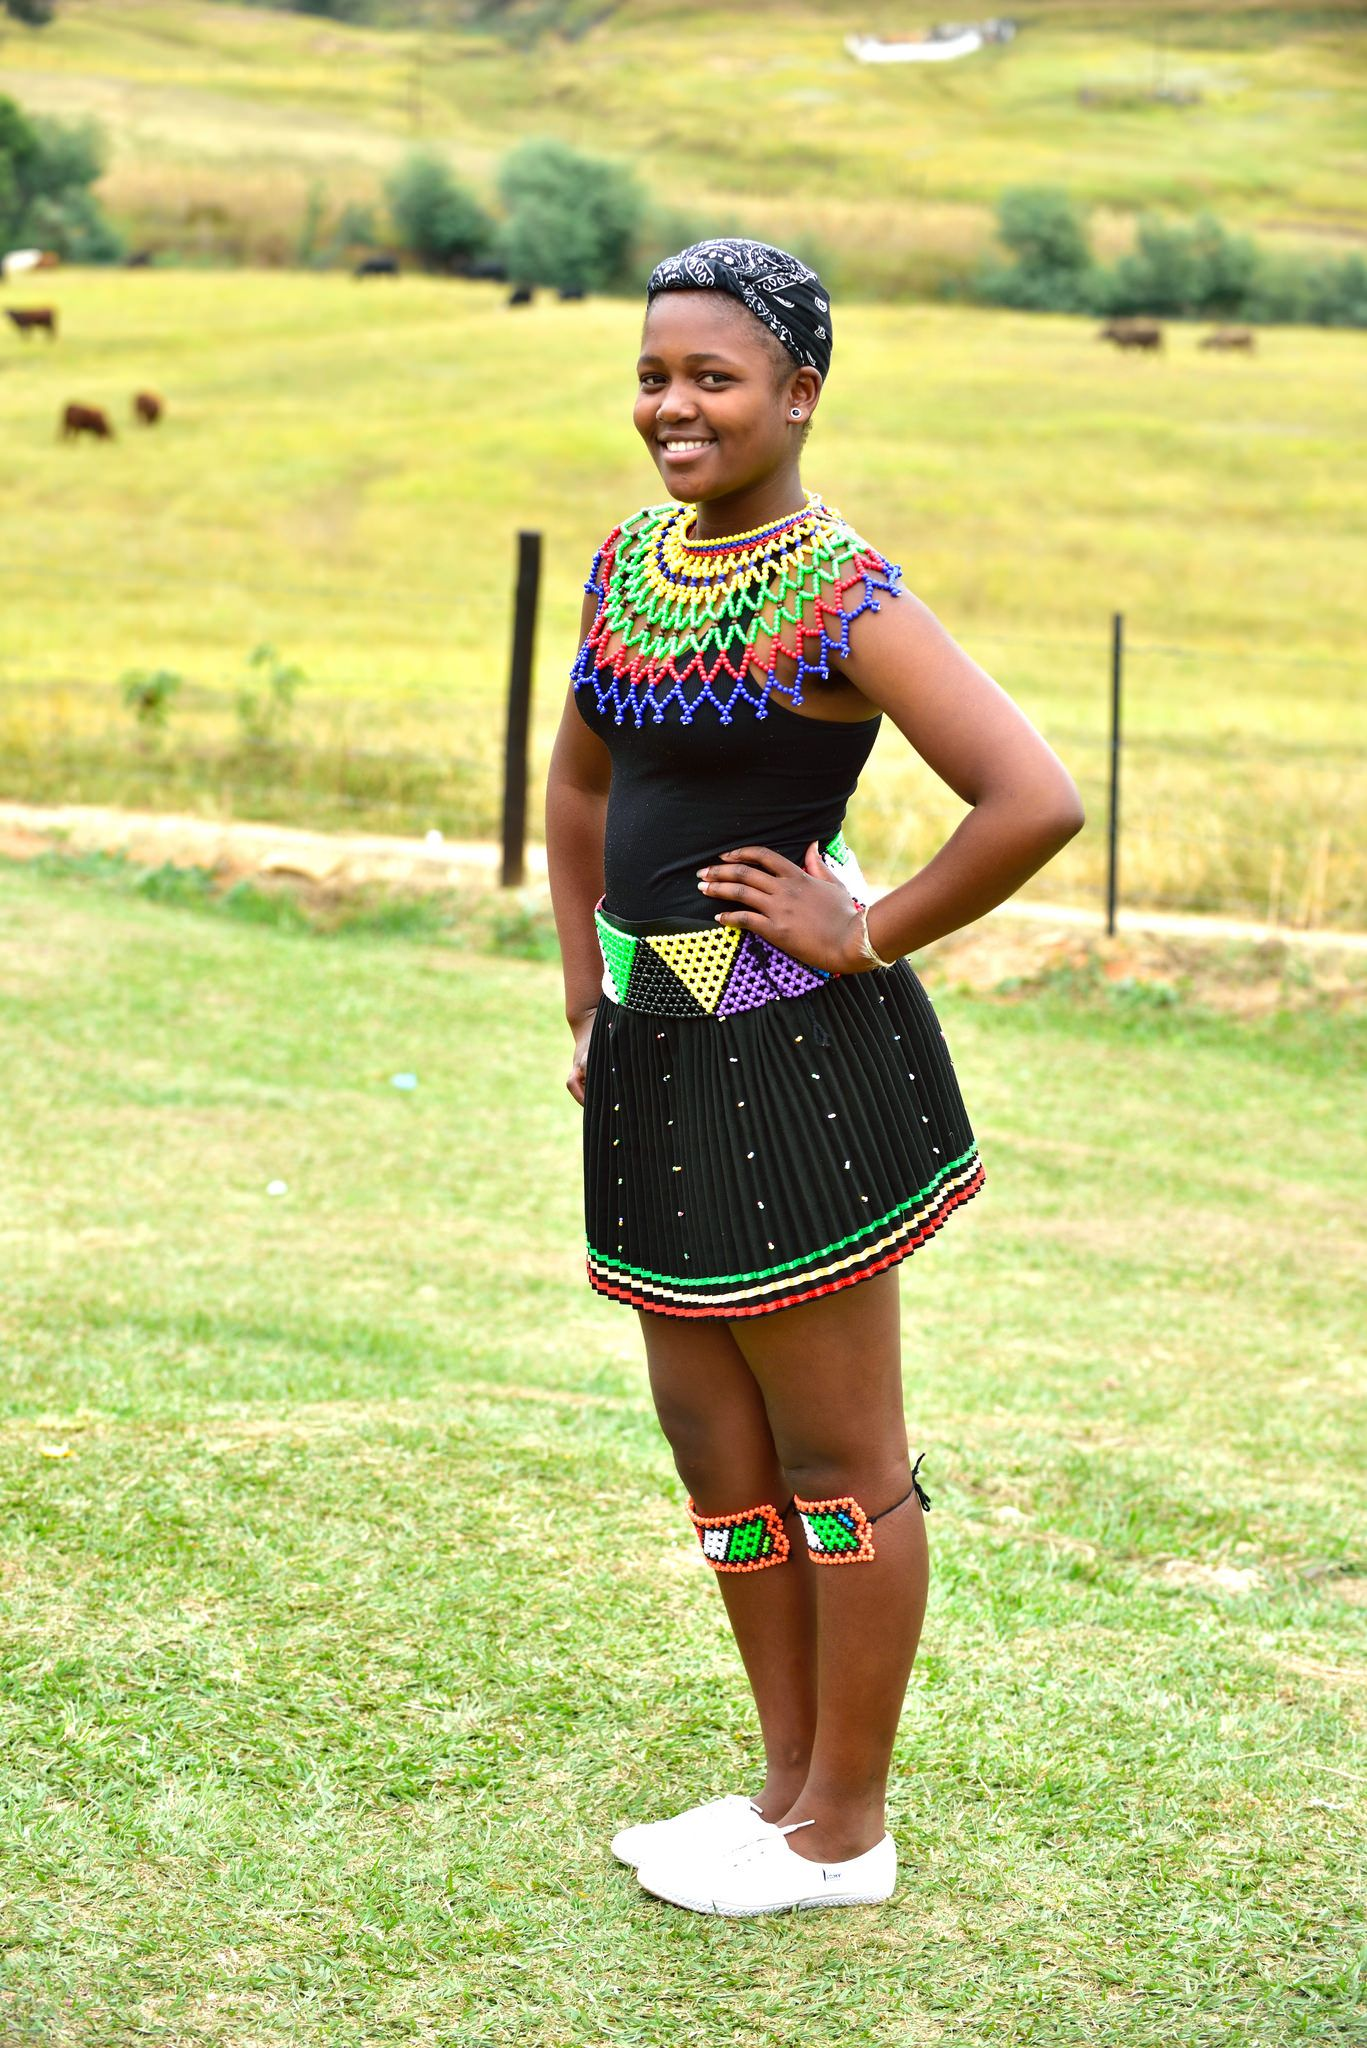 Zulu girls attend Umhlanga, the annual Reed Dance festival